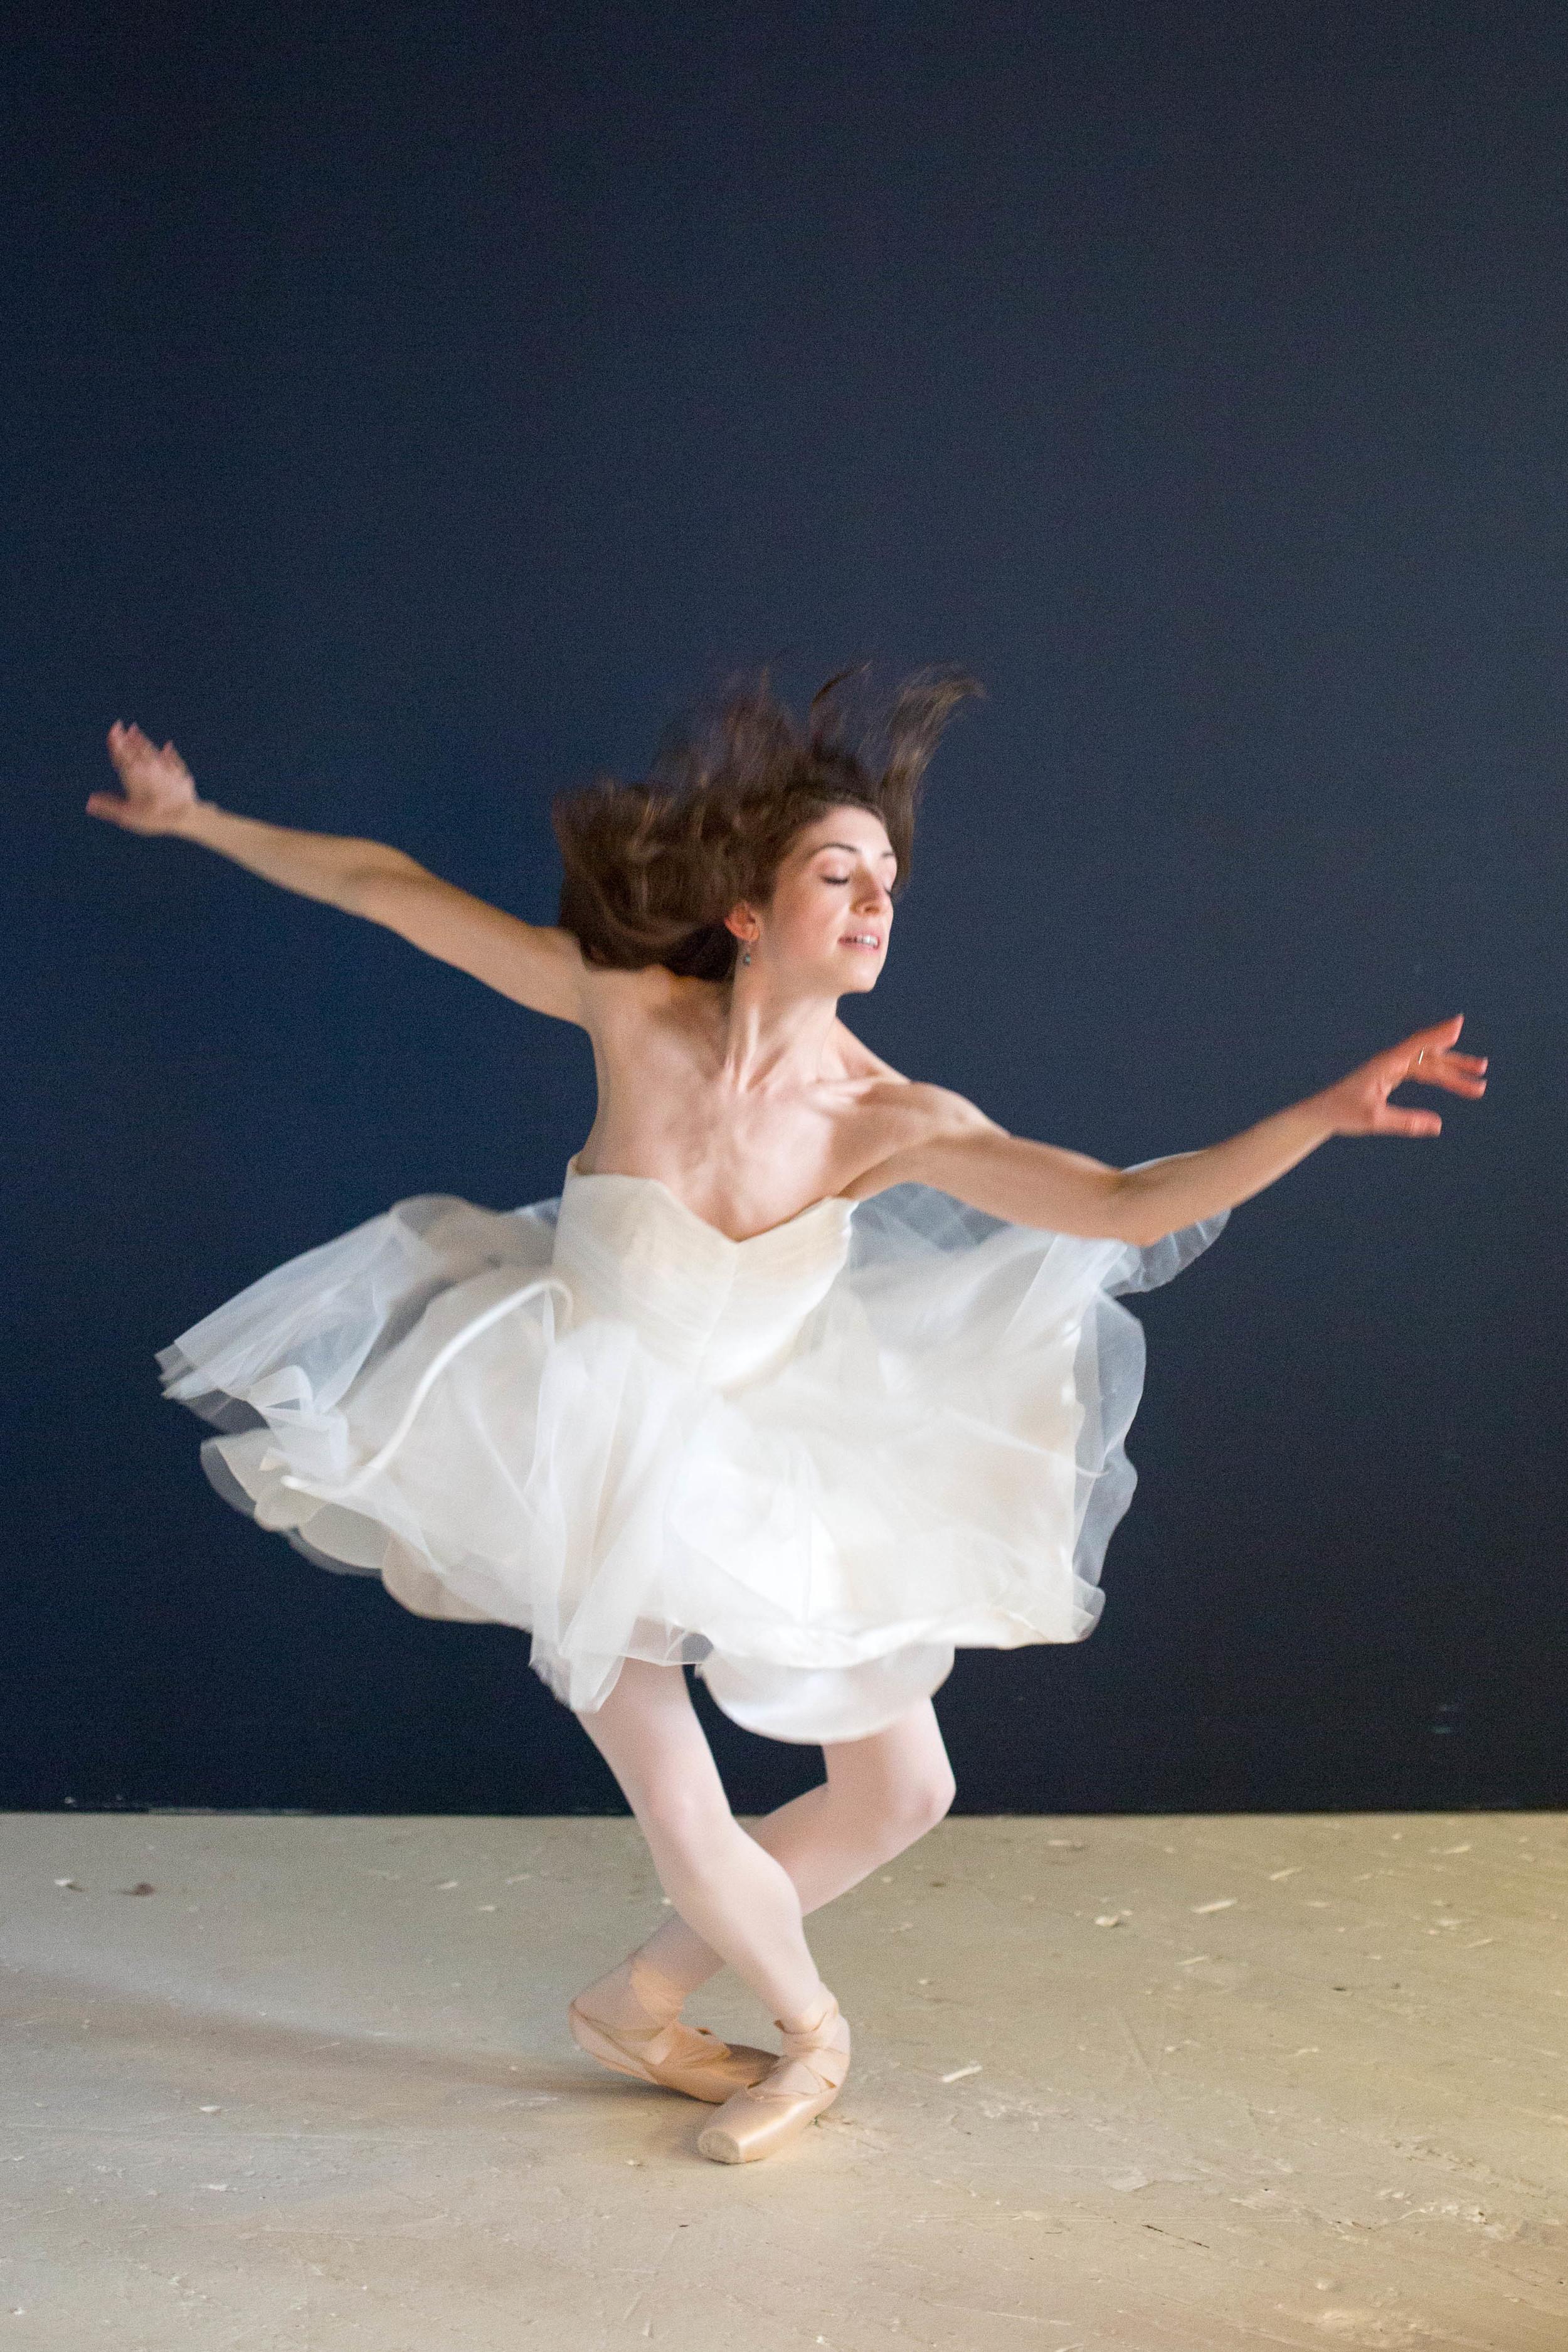 Dayton & Cincinnati OH Dance Studio Portrait Photographer, Dance Studio Photography, Ballet Studio Photographer, Modern Dance Studio Photographer, Fine Art Dance Portraits.